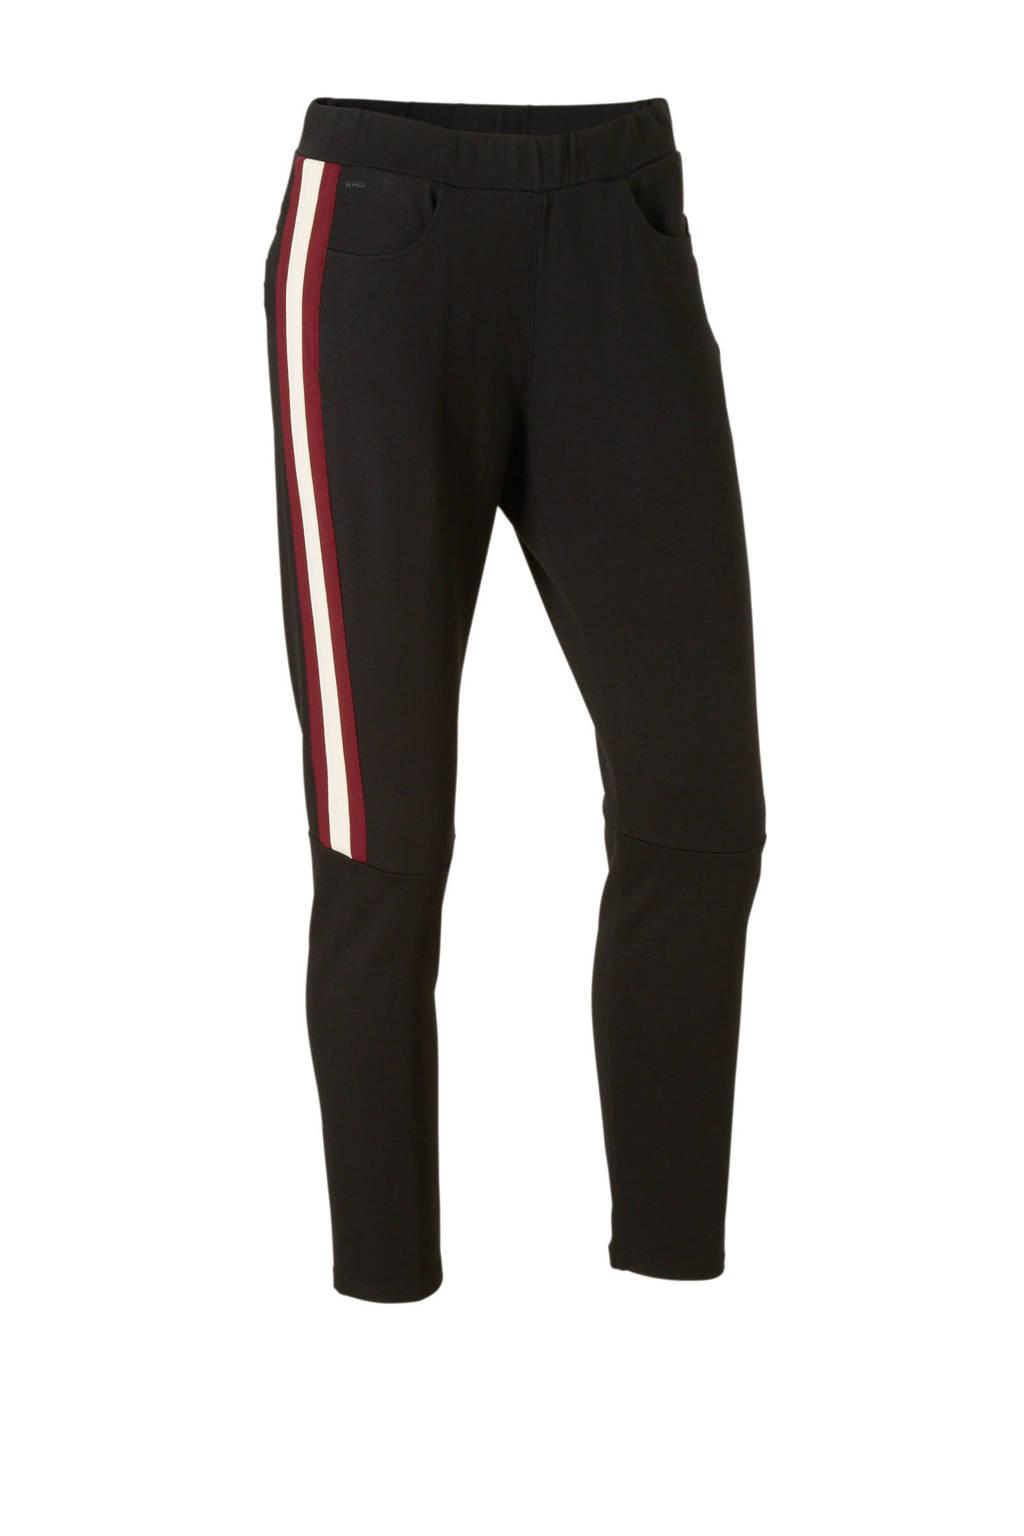 G-Star RAW skinny fit broek, Zwart